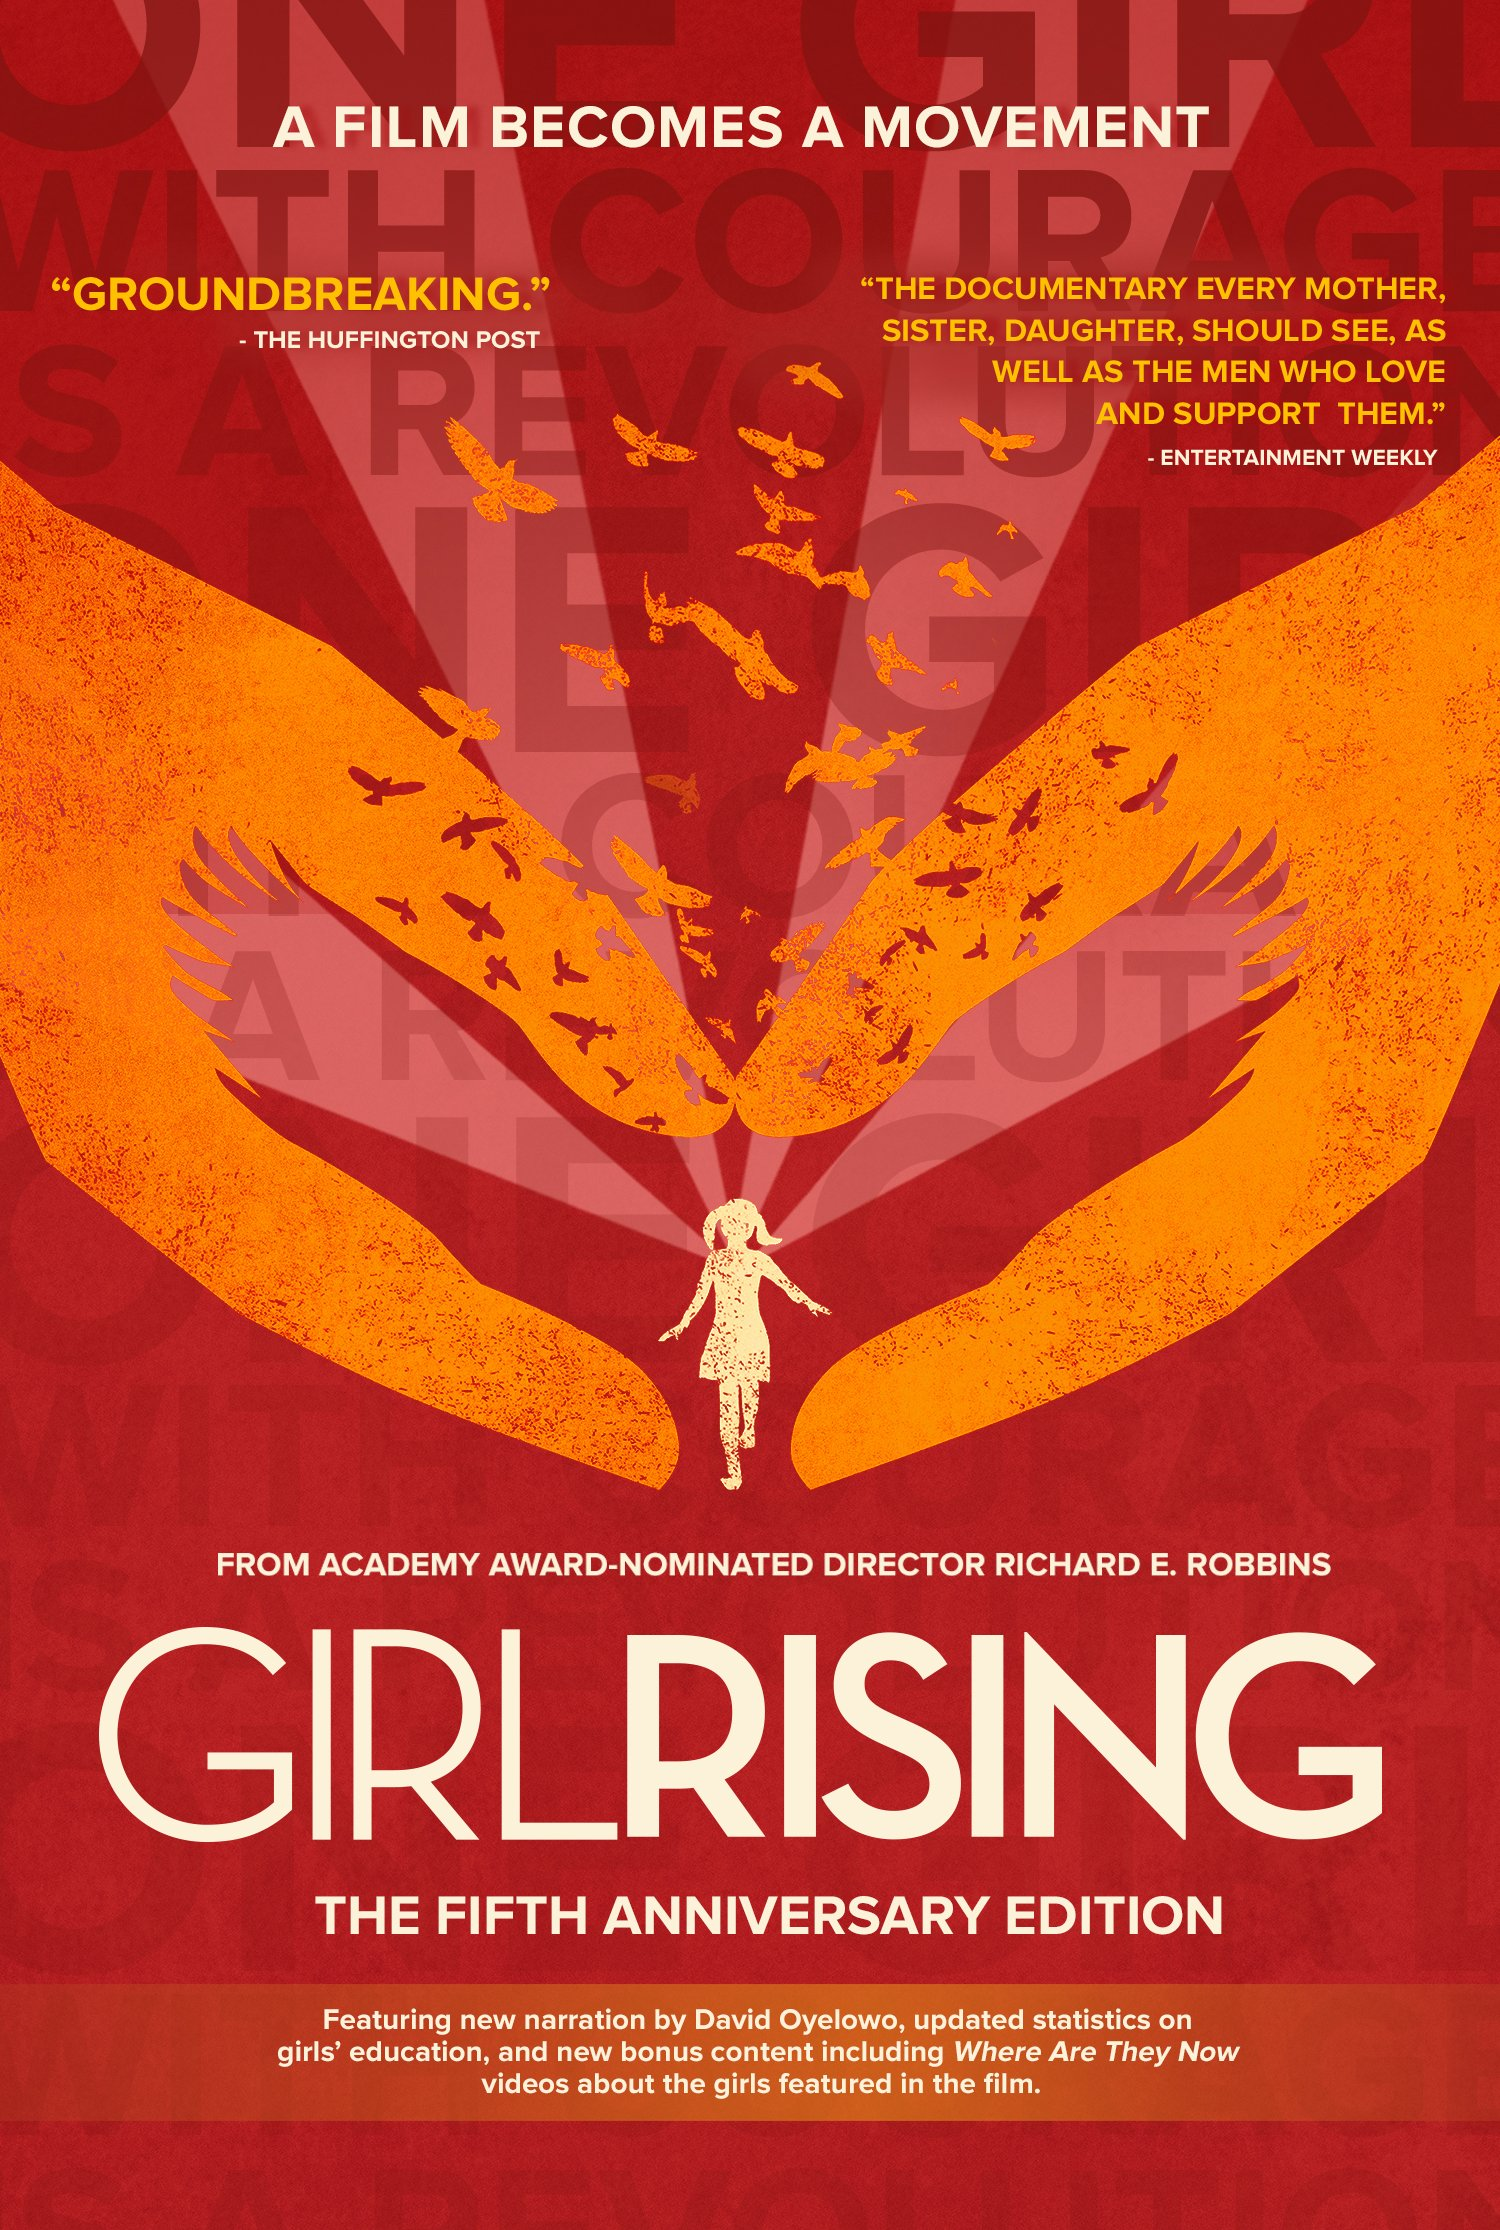 Girl Rising poster image